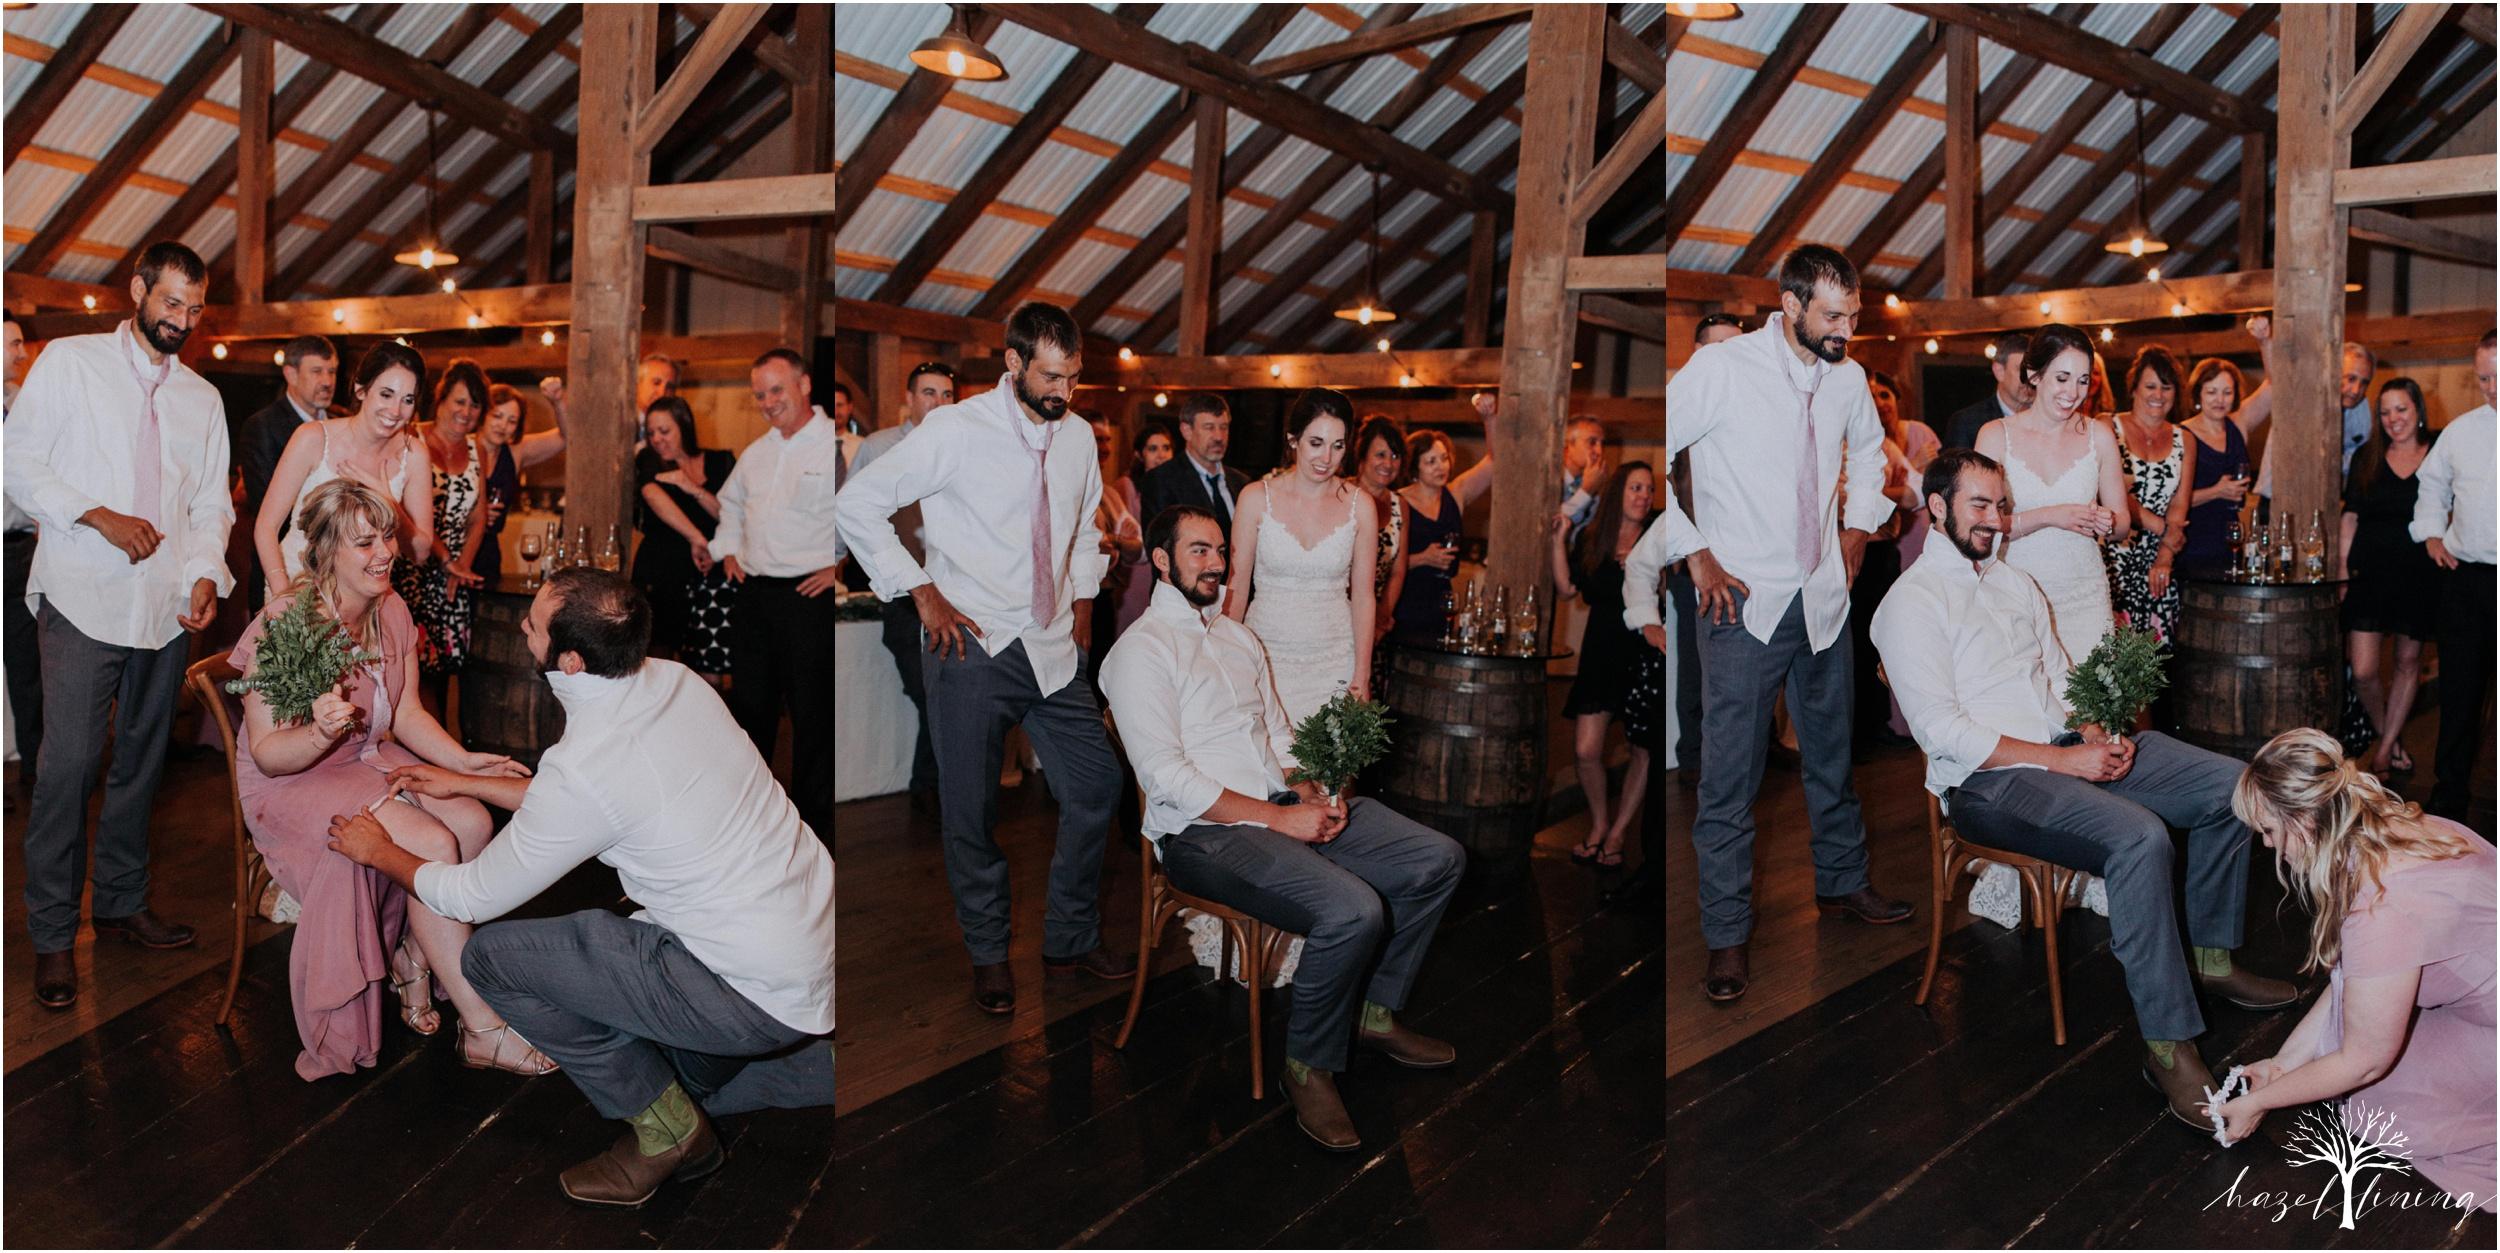 hazel-lining-travel-wedding-elopement-photography-lisa-landon-shoemaker-the-farm-bakery-and-events-bucks-county-quakertown-pennsylvania-summer-country-outdoor-farm-wedding_0173.jpg